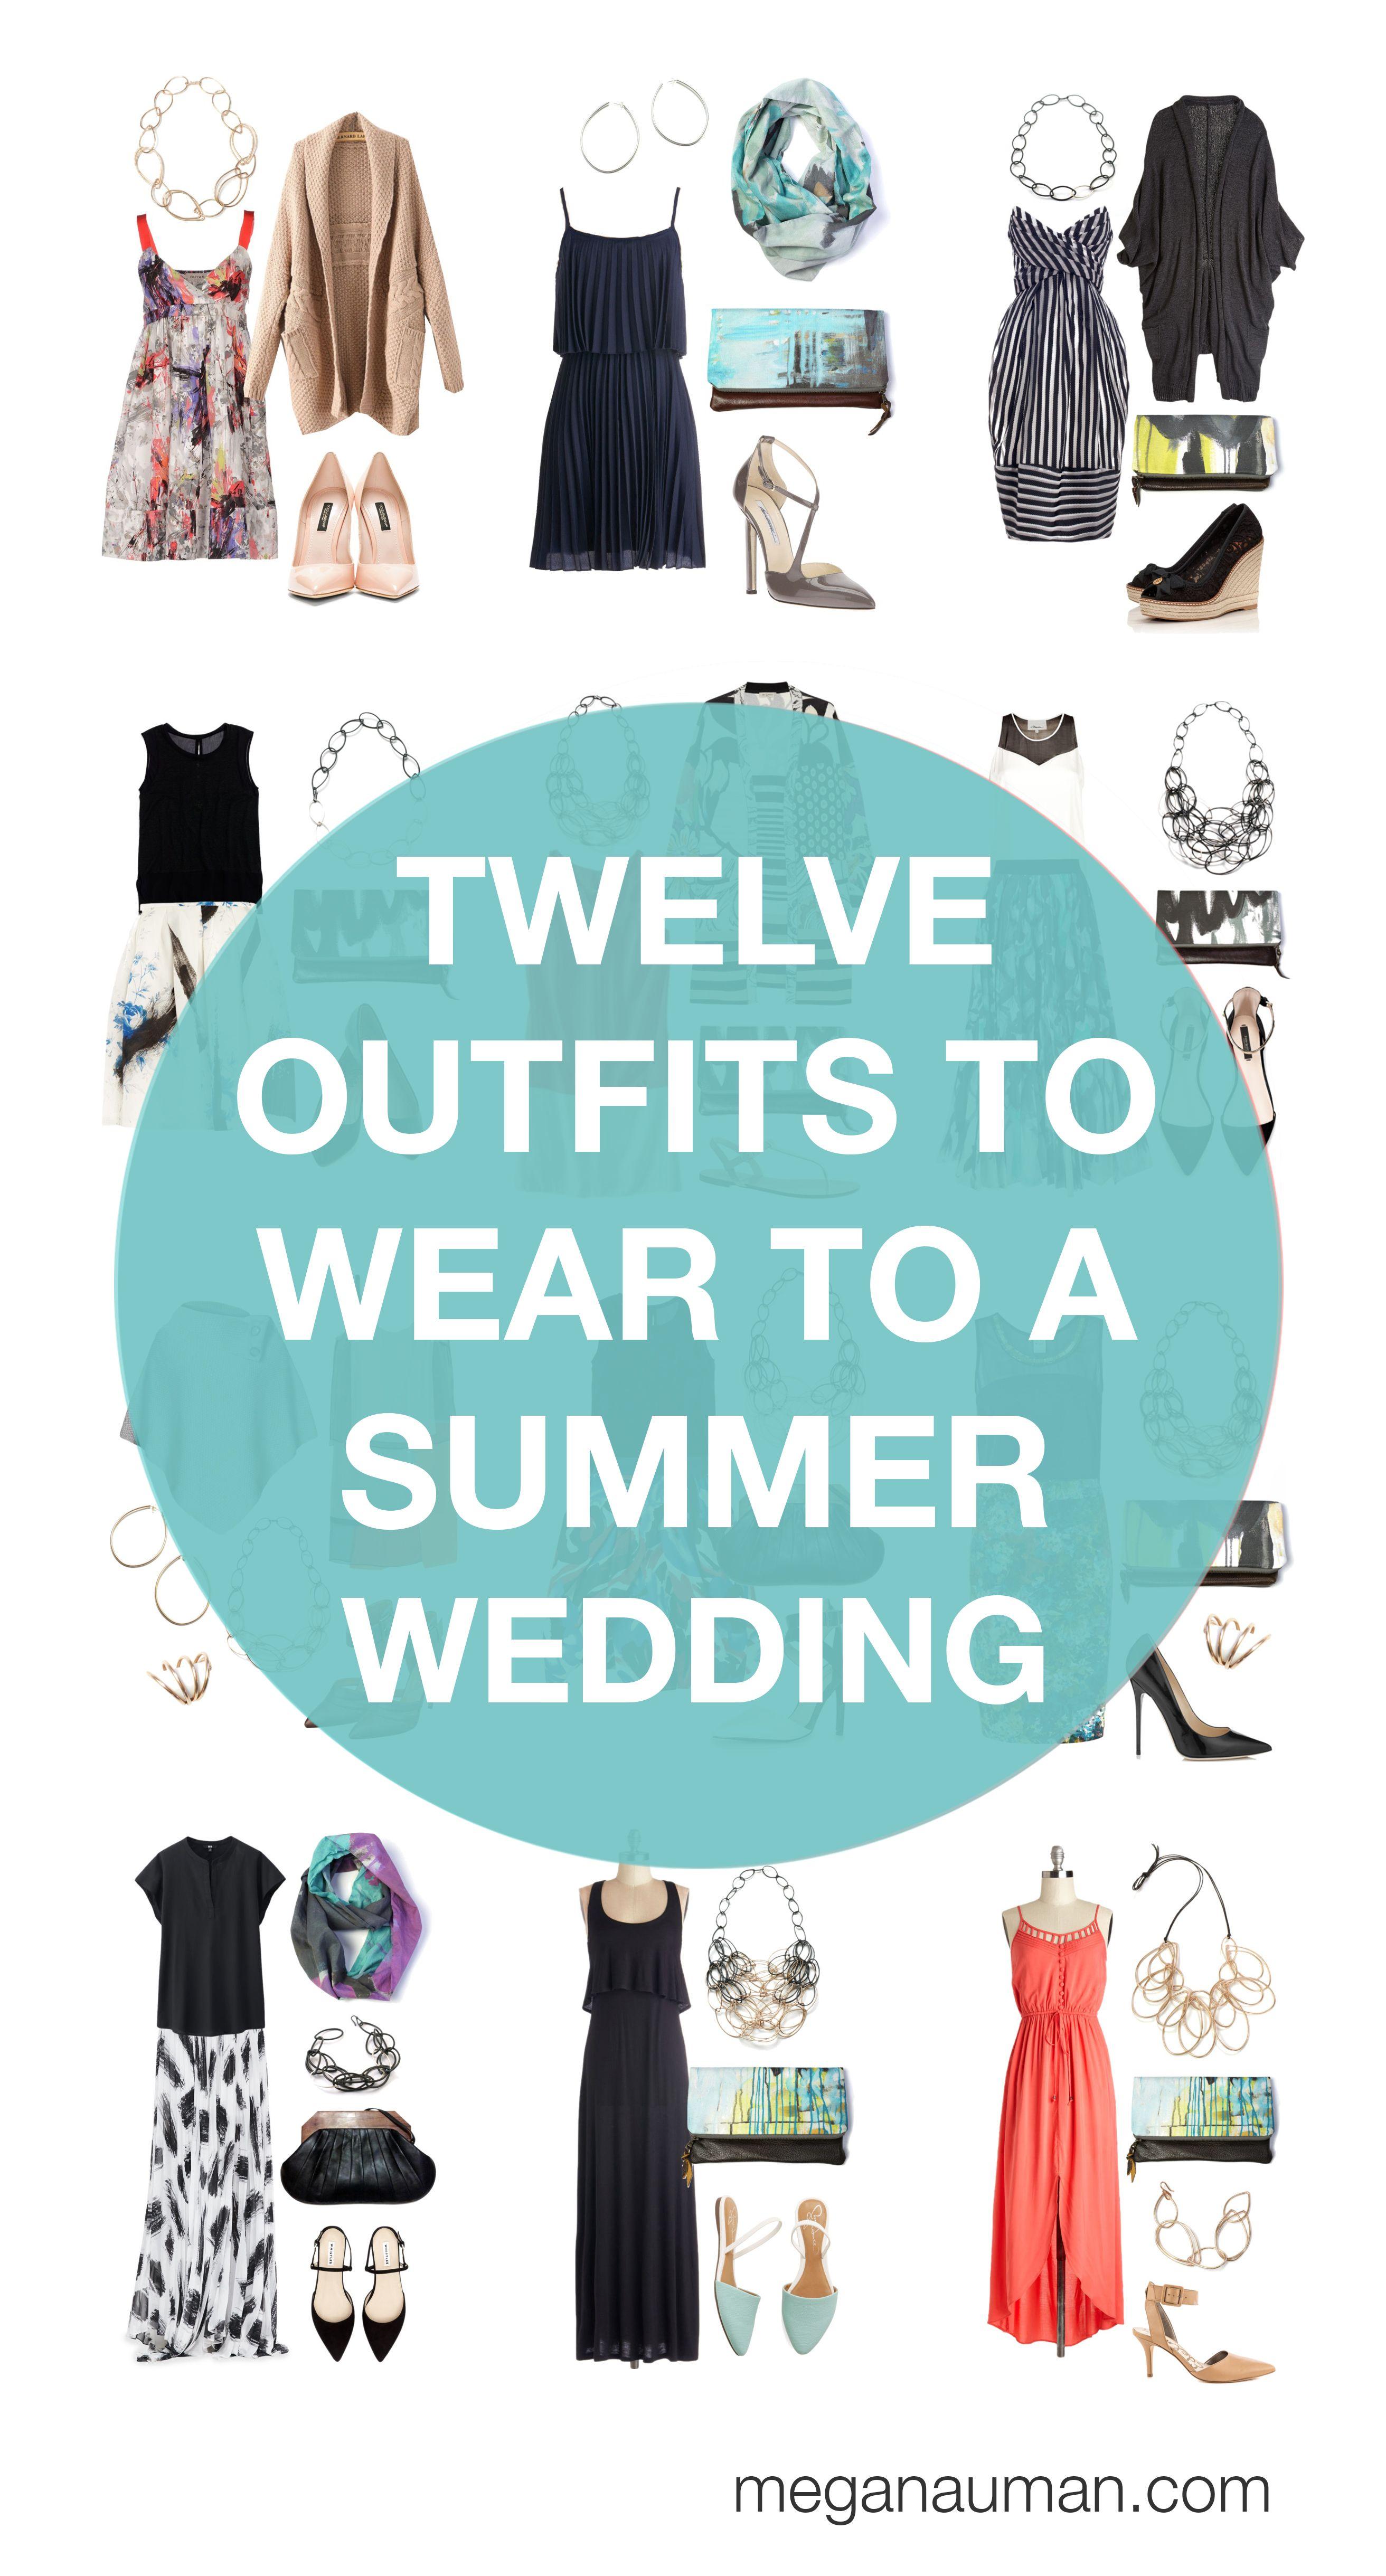 0c274d4c28a6 what to wear to a summer wedding  12 outfit ideas via megan auman